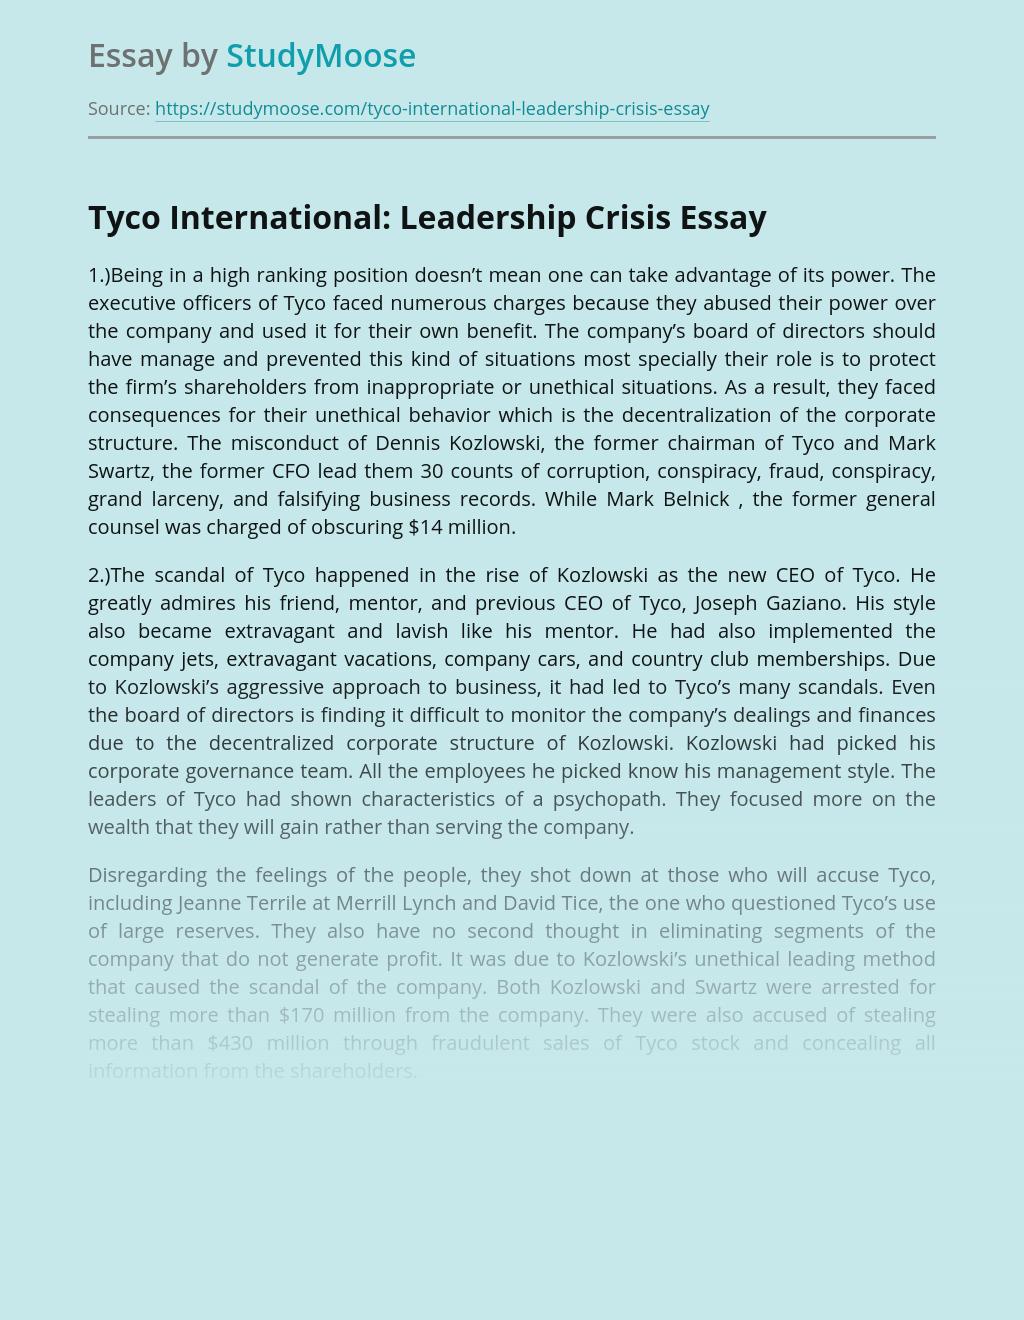 Tyco International: Leadership Crisis